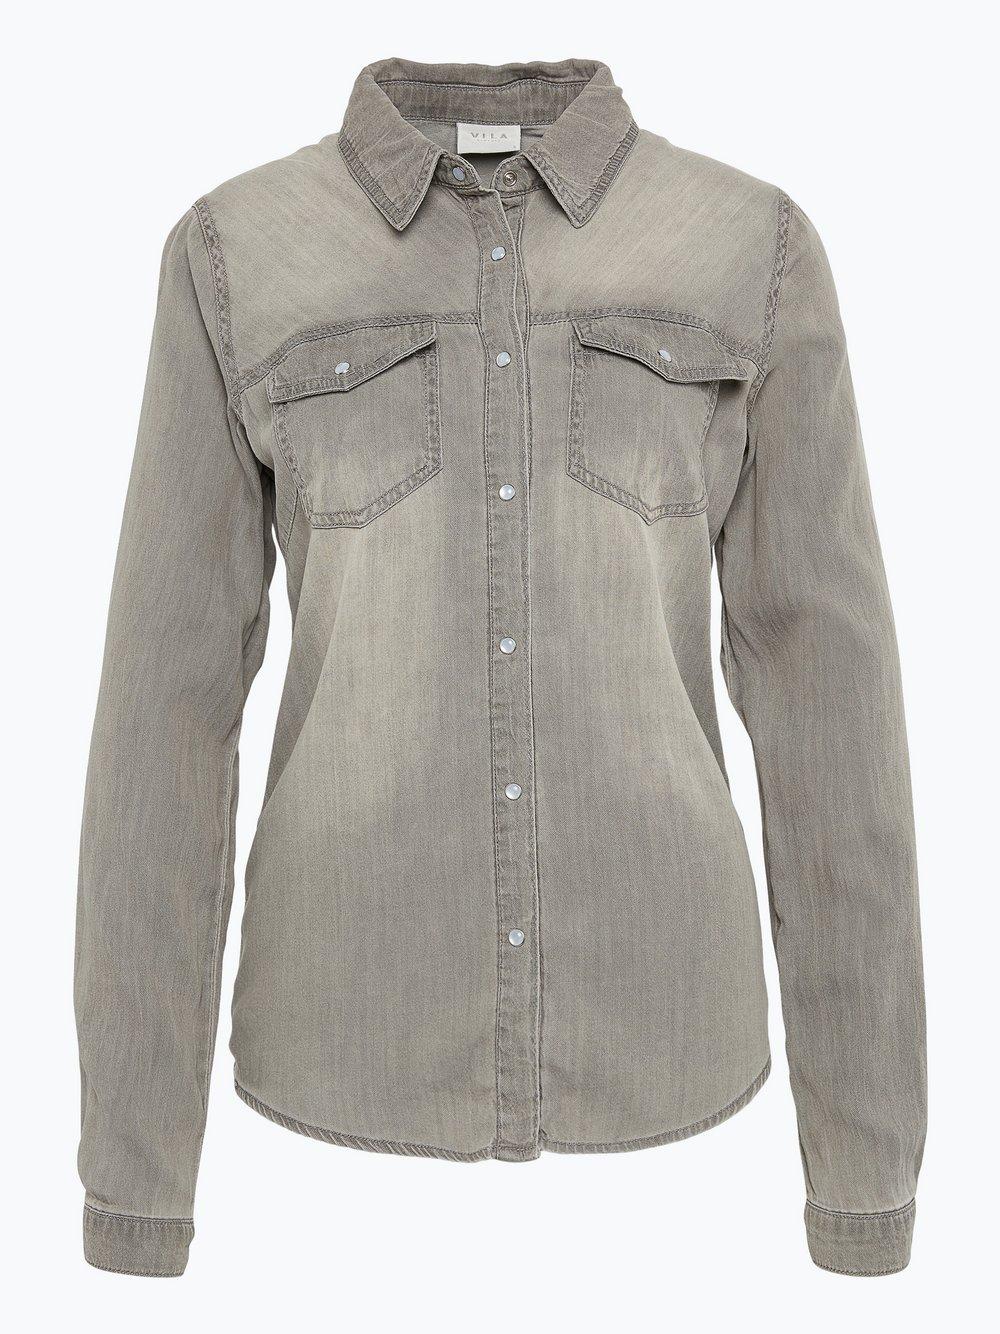 Vila - Damska koszula jeansowa – Vibista, szary